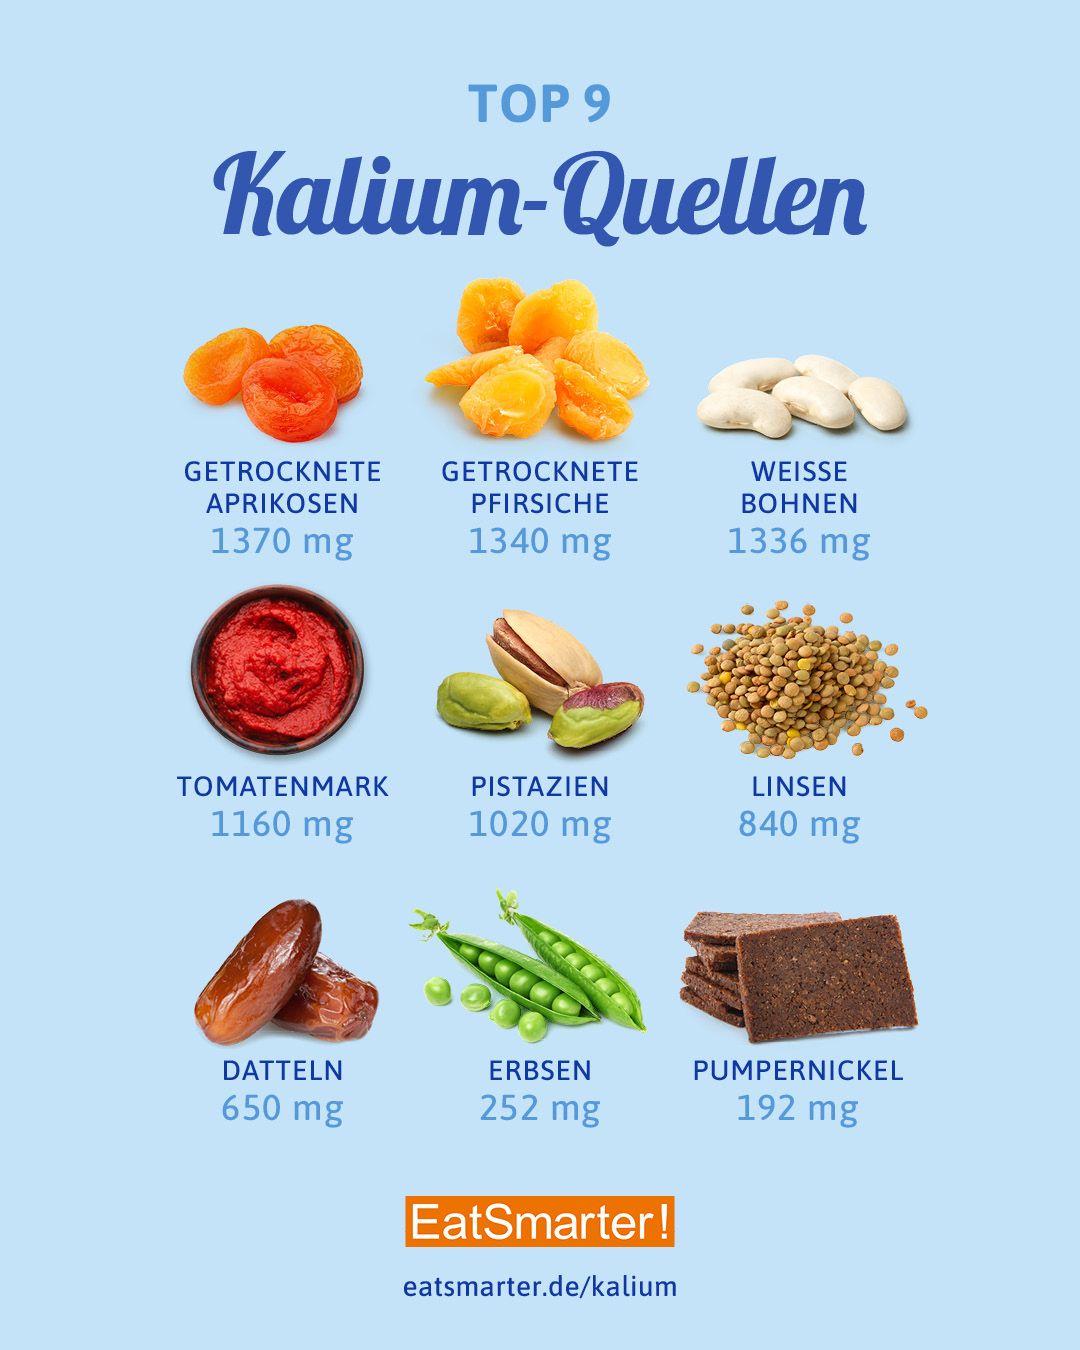 Wusstest du, dass Kalium an Prozessen jeder Zelle unseres Körpers beteiligt ist? Was der lebenswichtige Mineralstoff noch alles kann, erfährst du hier.   eatsmarter.de #infografik #nahrungsmittel #lebensmittel #ernährung #kalium #kaliumquellen